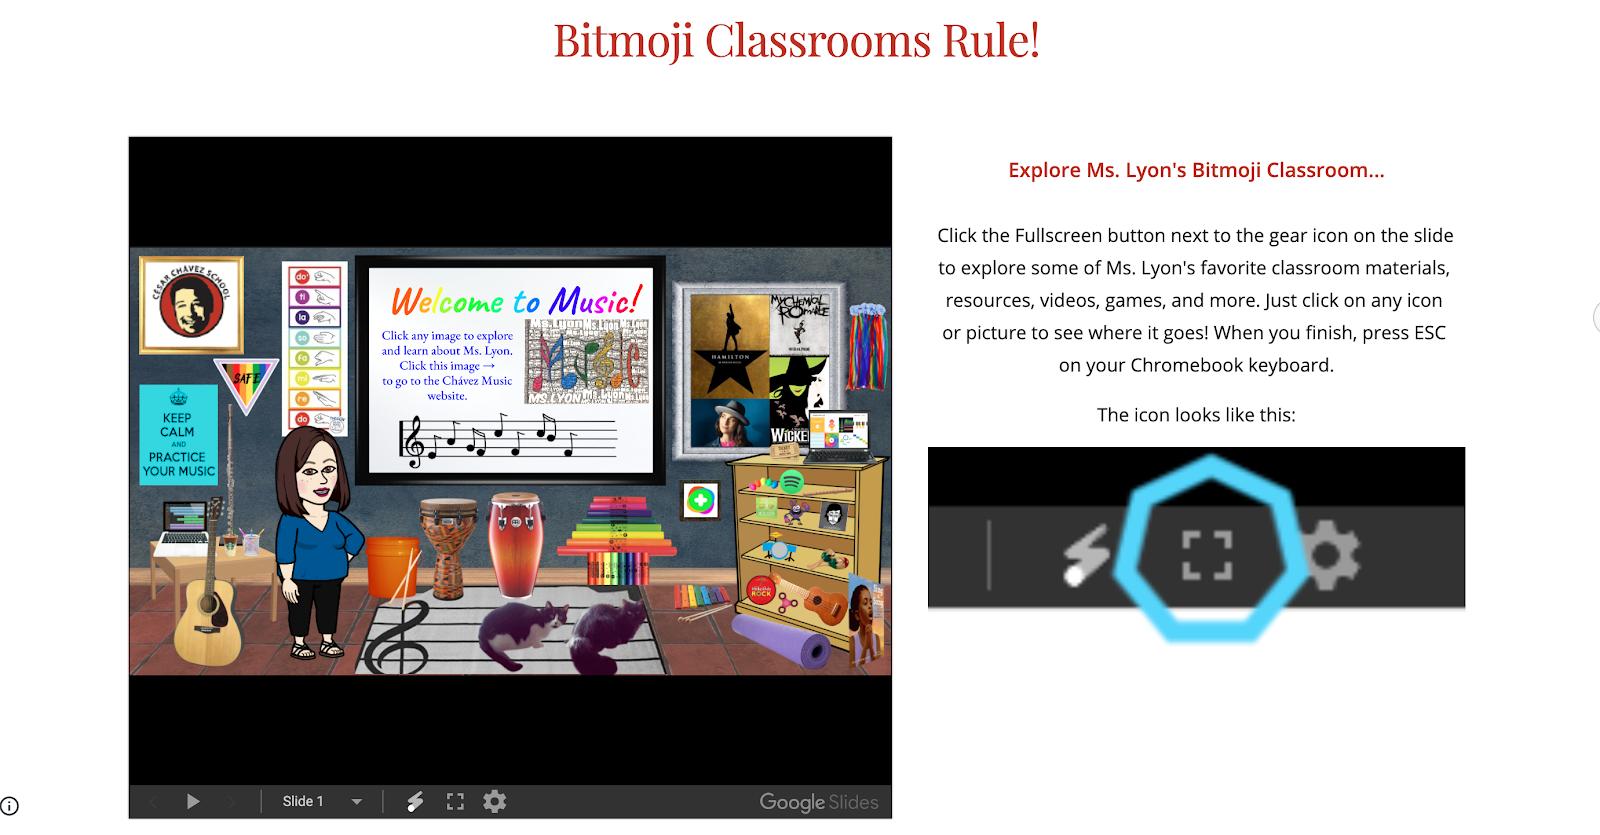 Ms. Lyon's Bitmoji Classroom